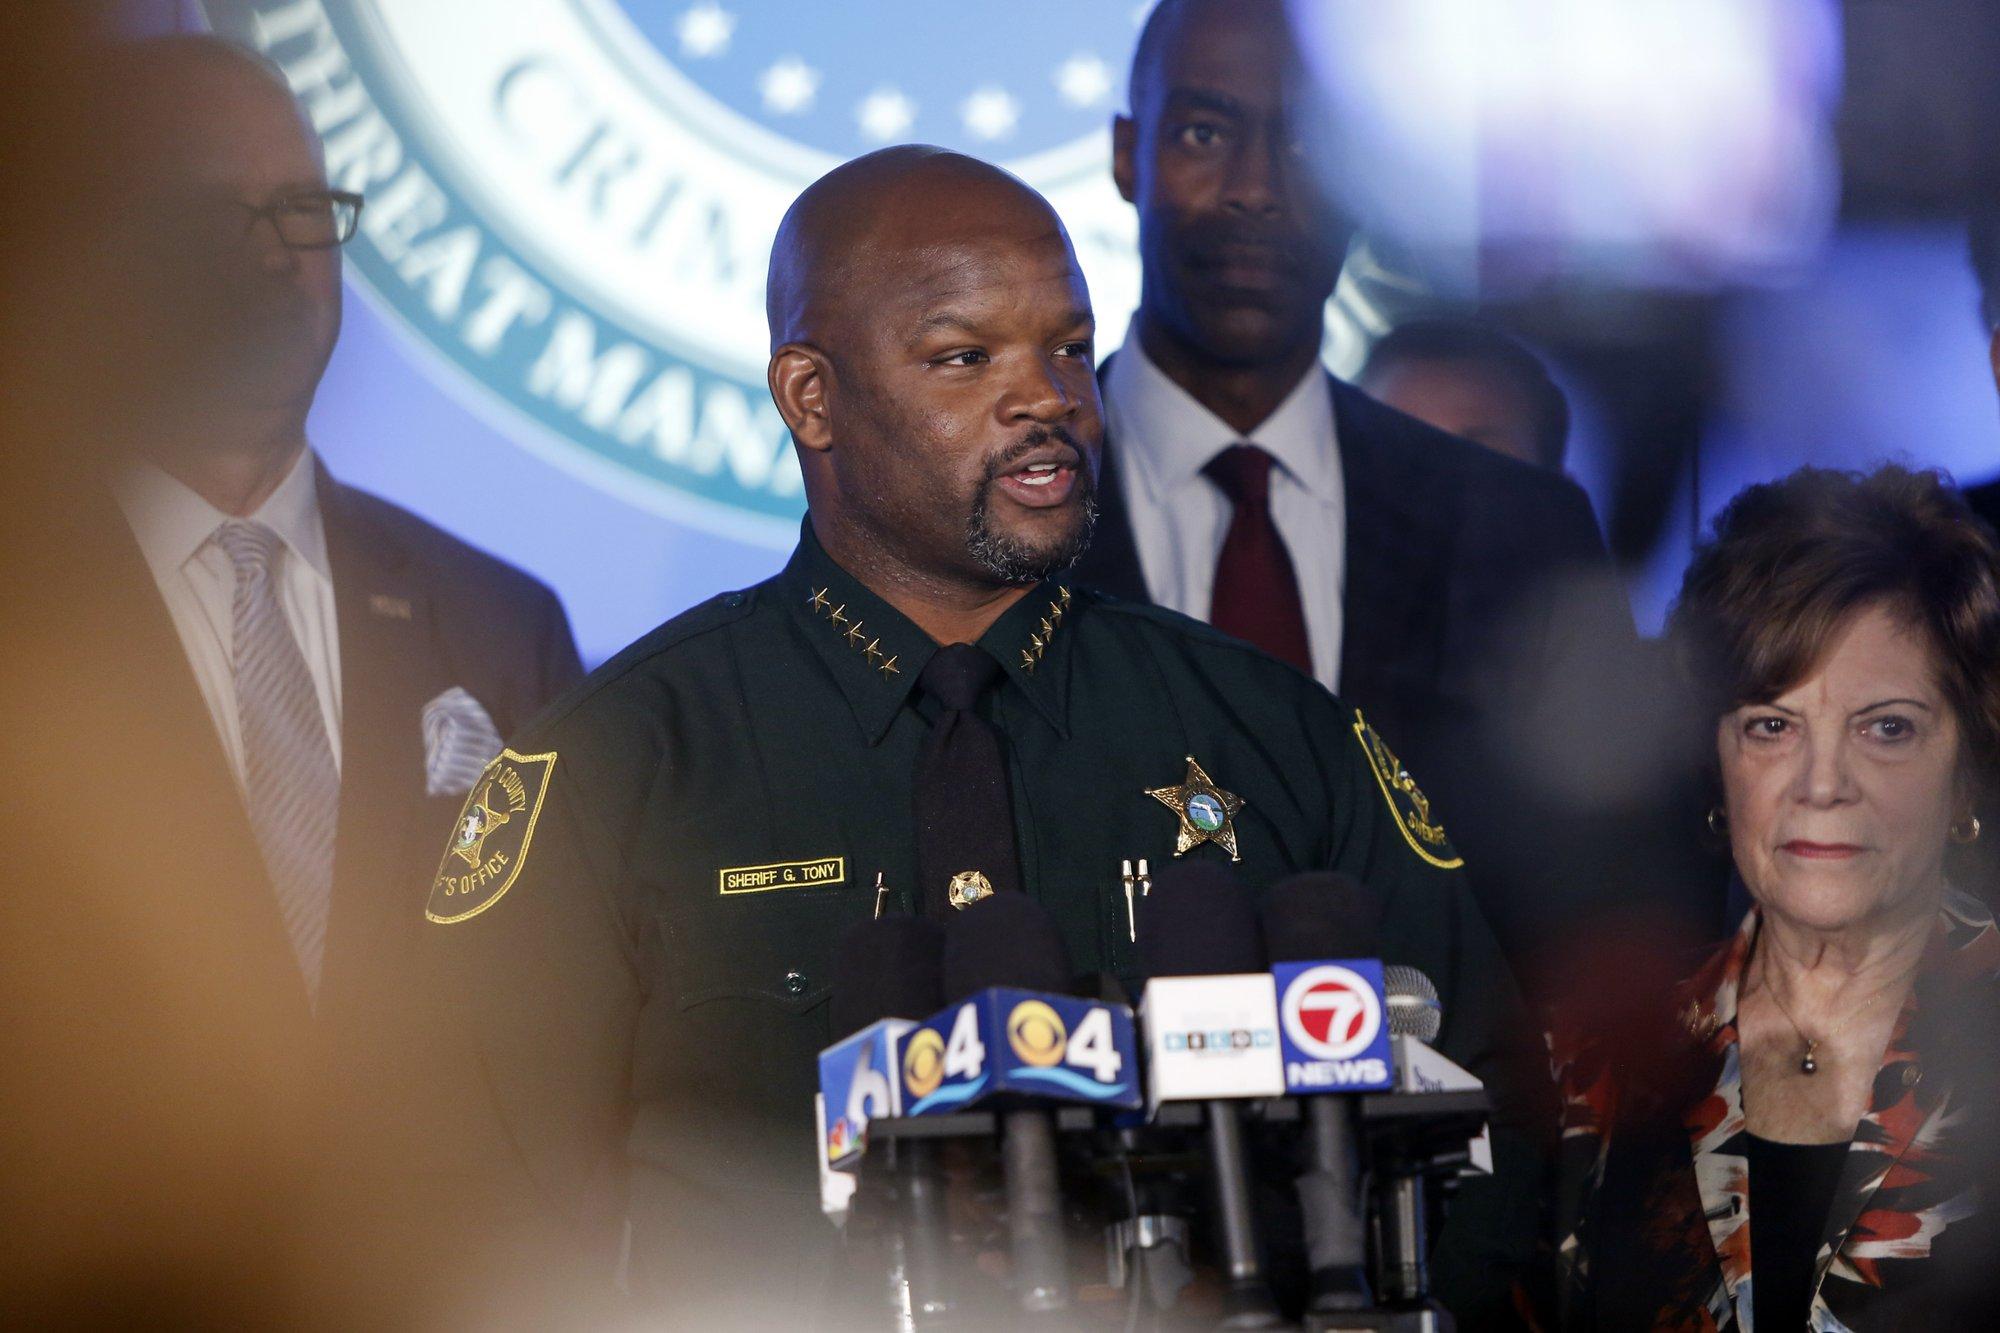 New surveillance center in county that had school massacre